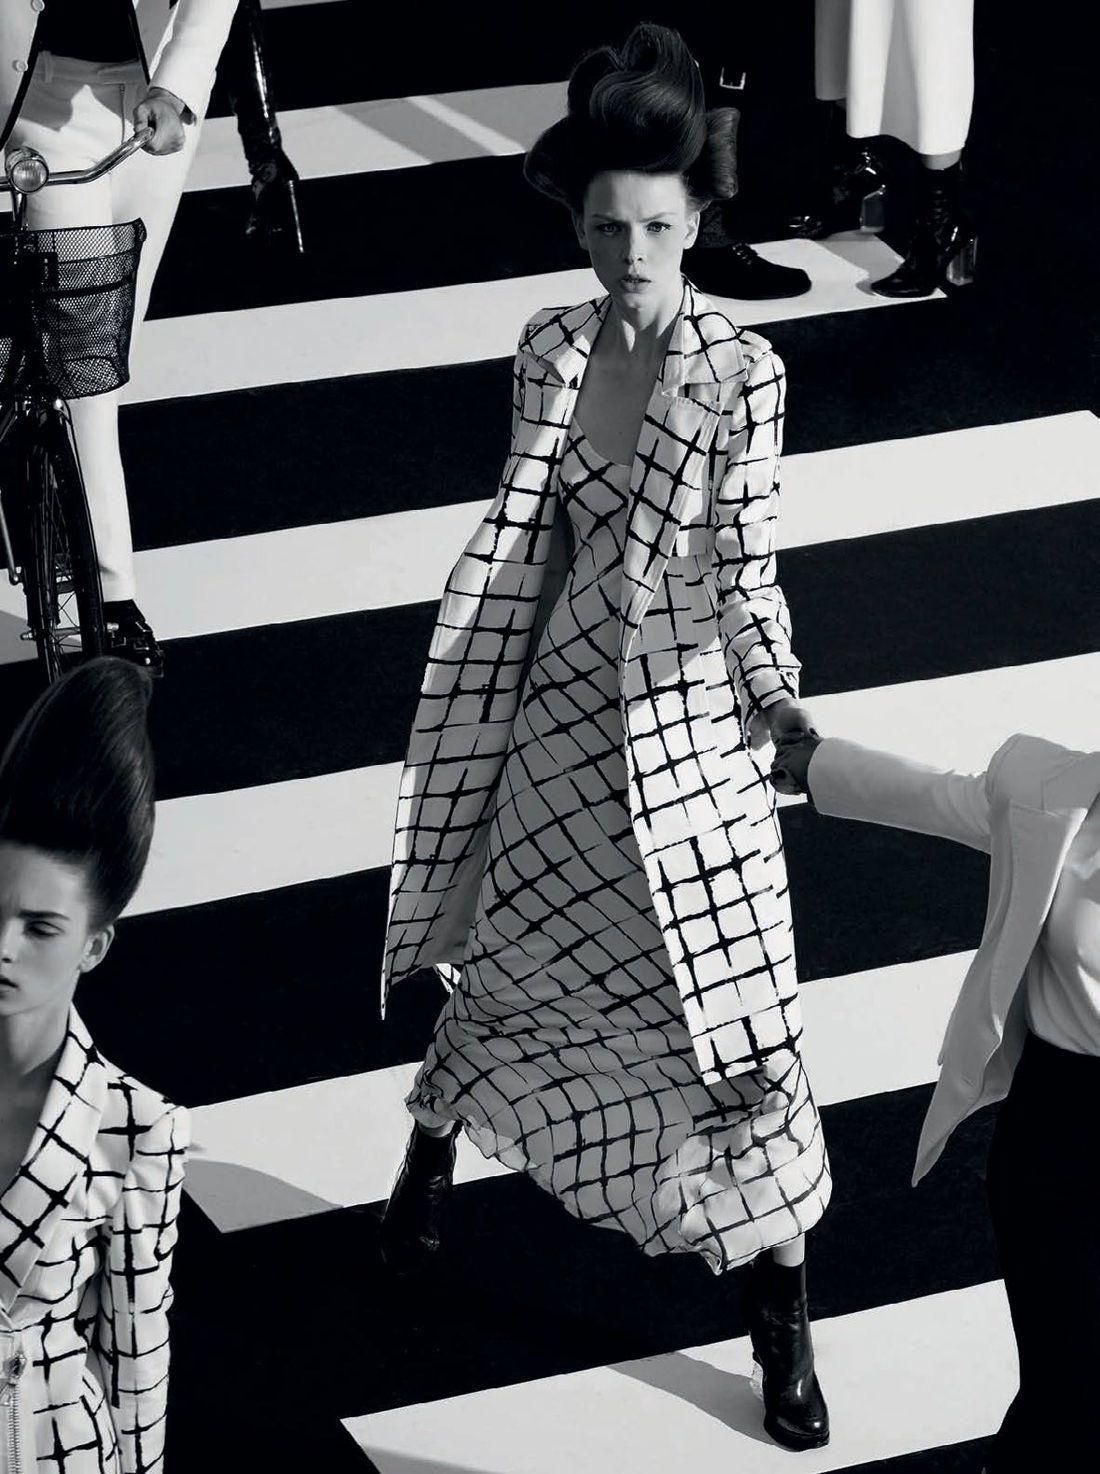 O Preto No Branco: Dani Witt by Paulo Vainer for Vogue Brazil August 2015